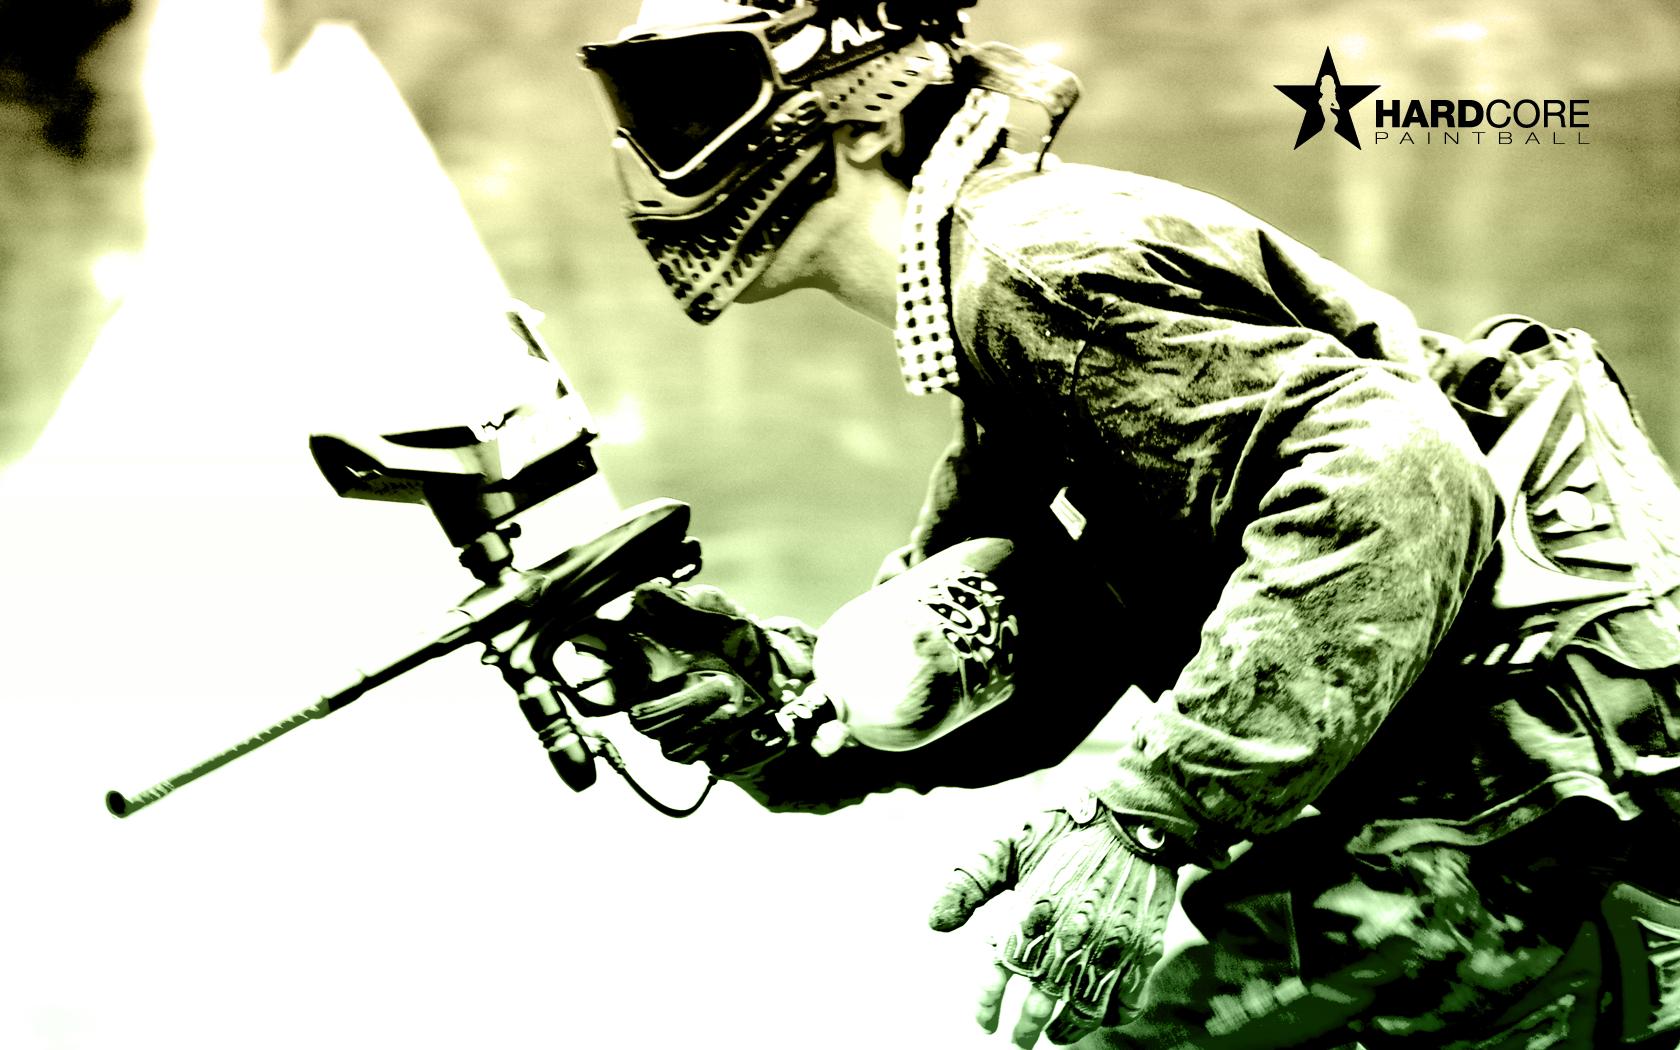 paintball wallpaper - Pesquisa Google | [ IED 2015 TCC ] Carlos